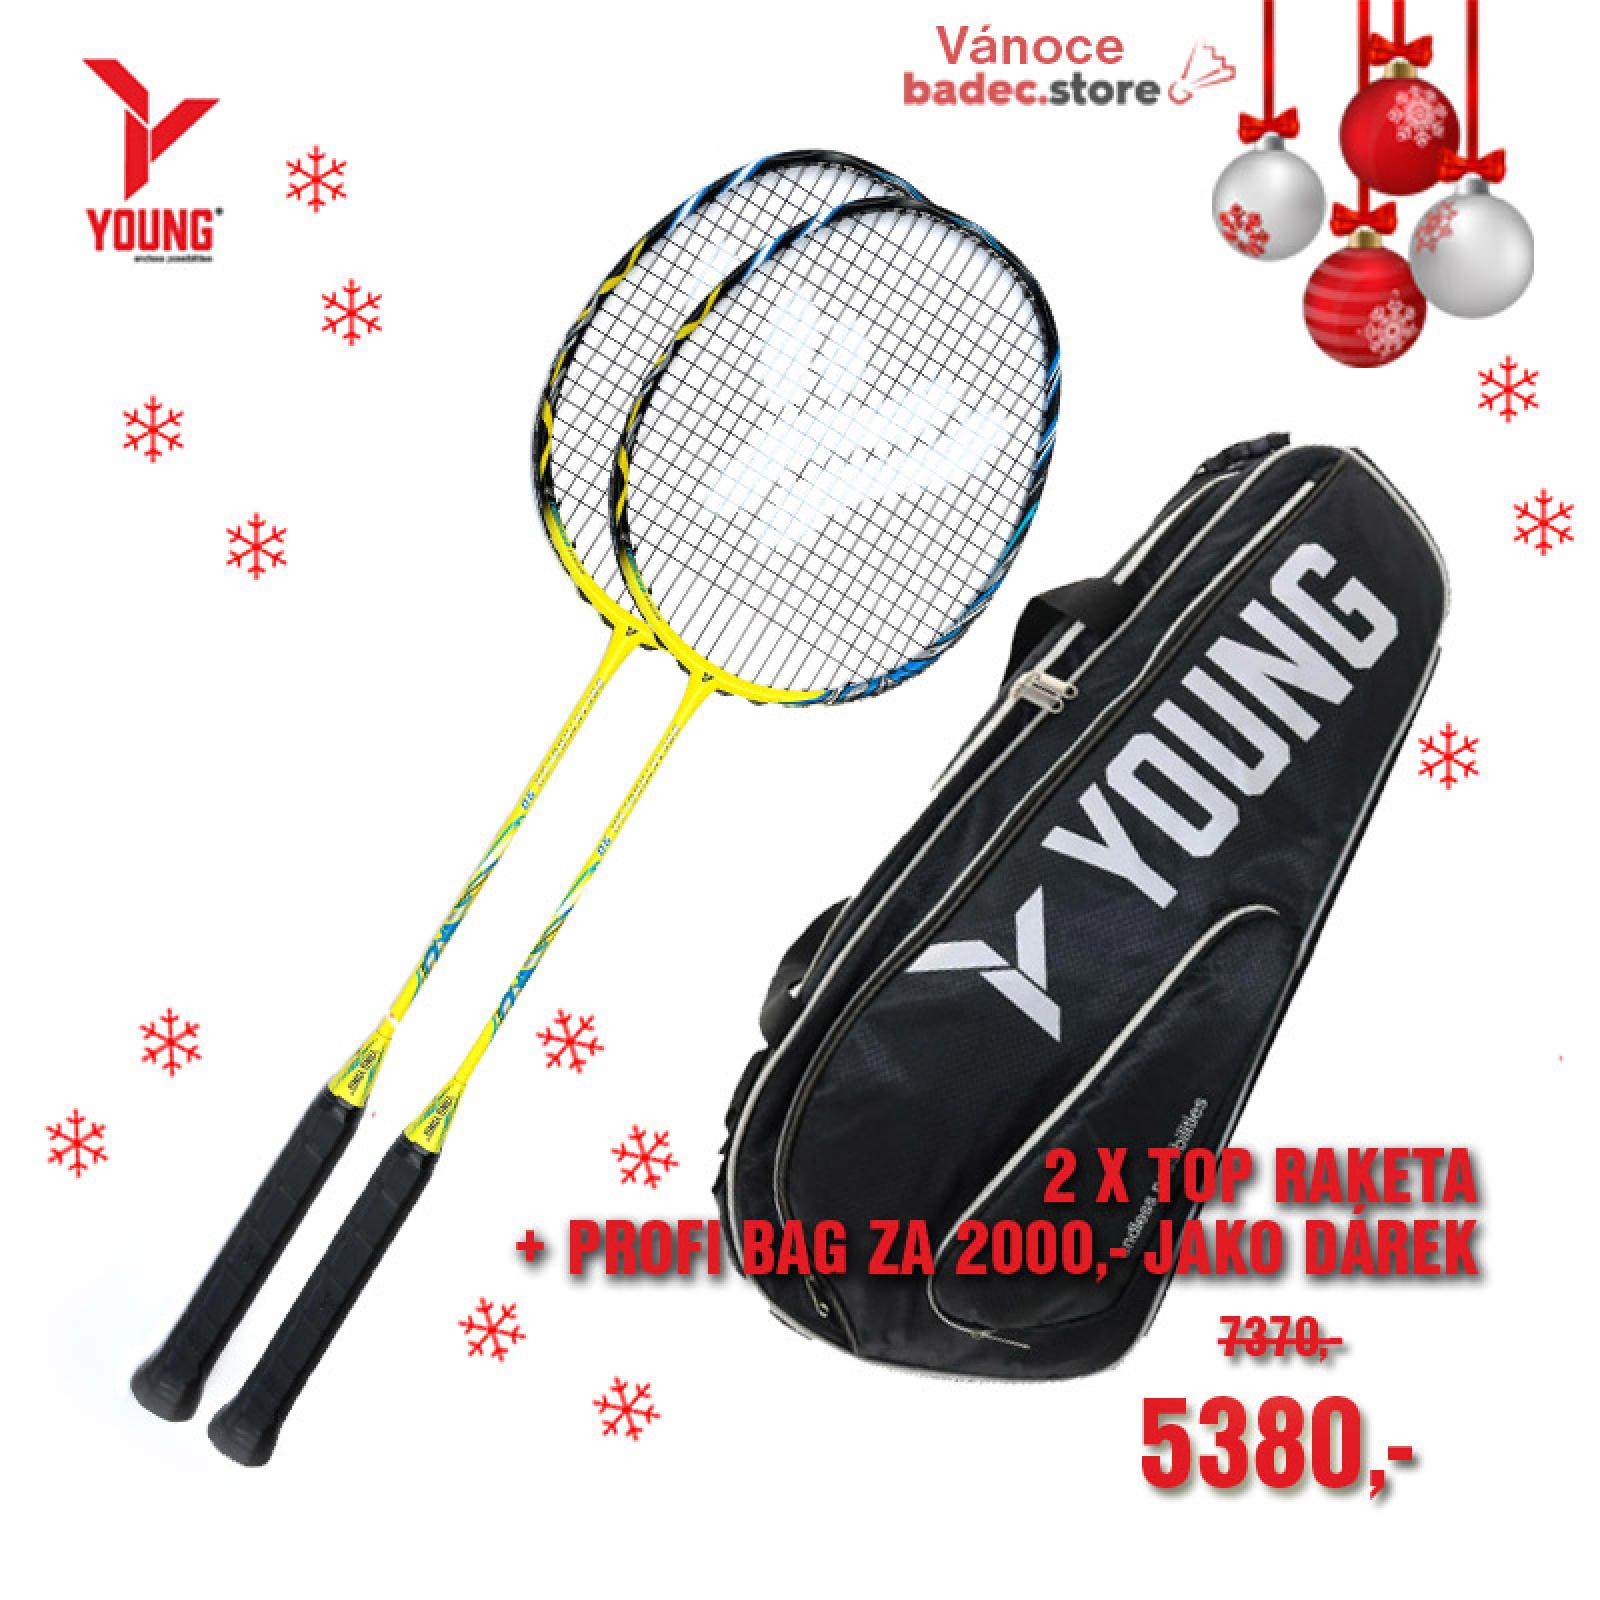 https://www.badec.store/produkty_img/badmintonova-raketa1575968015L.jpg